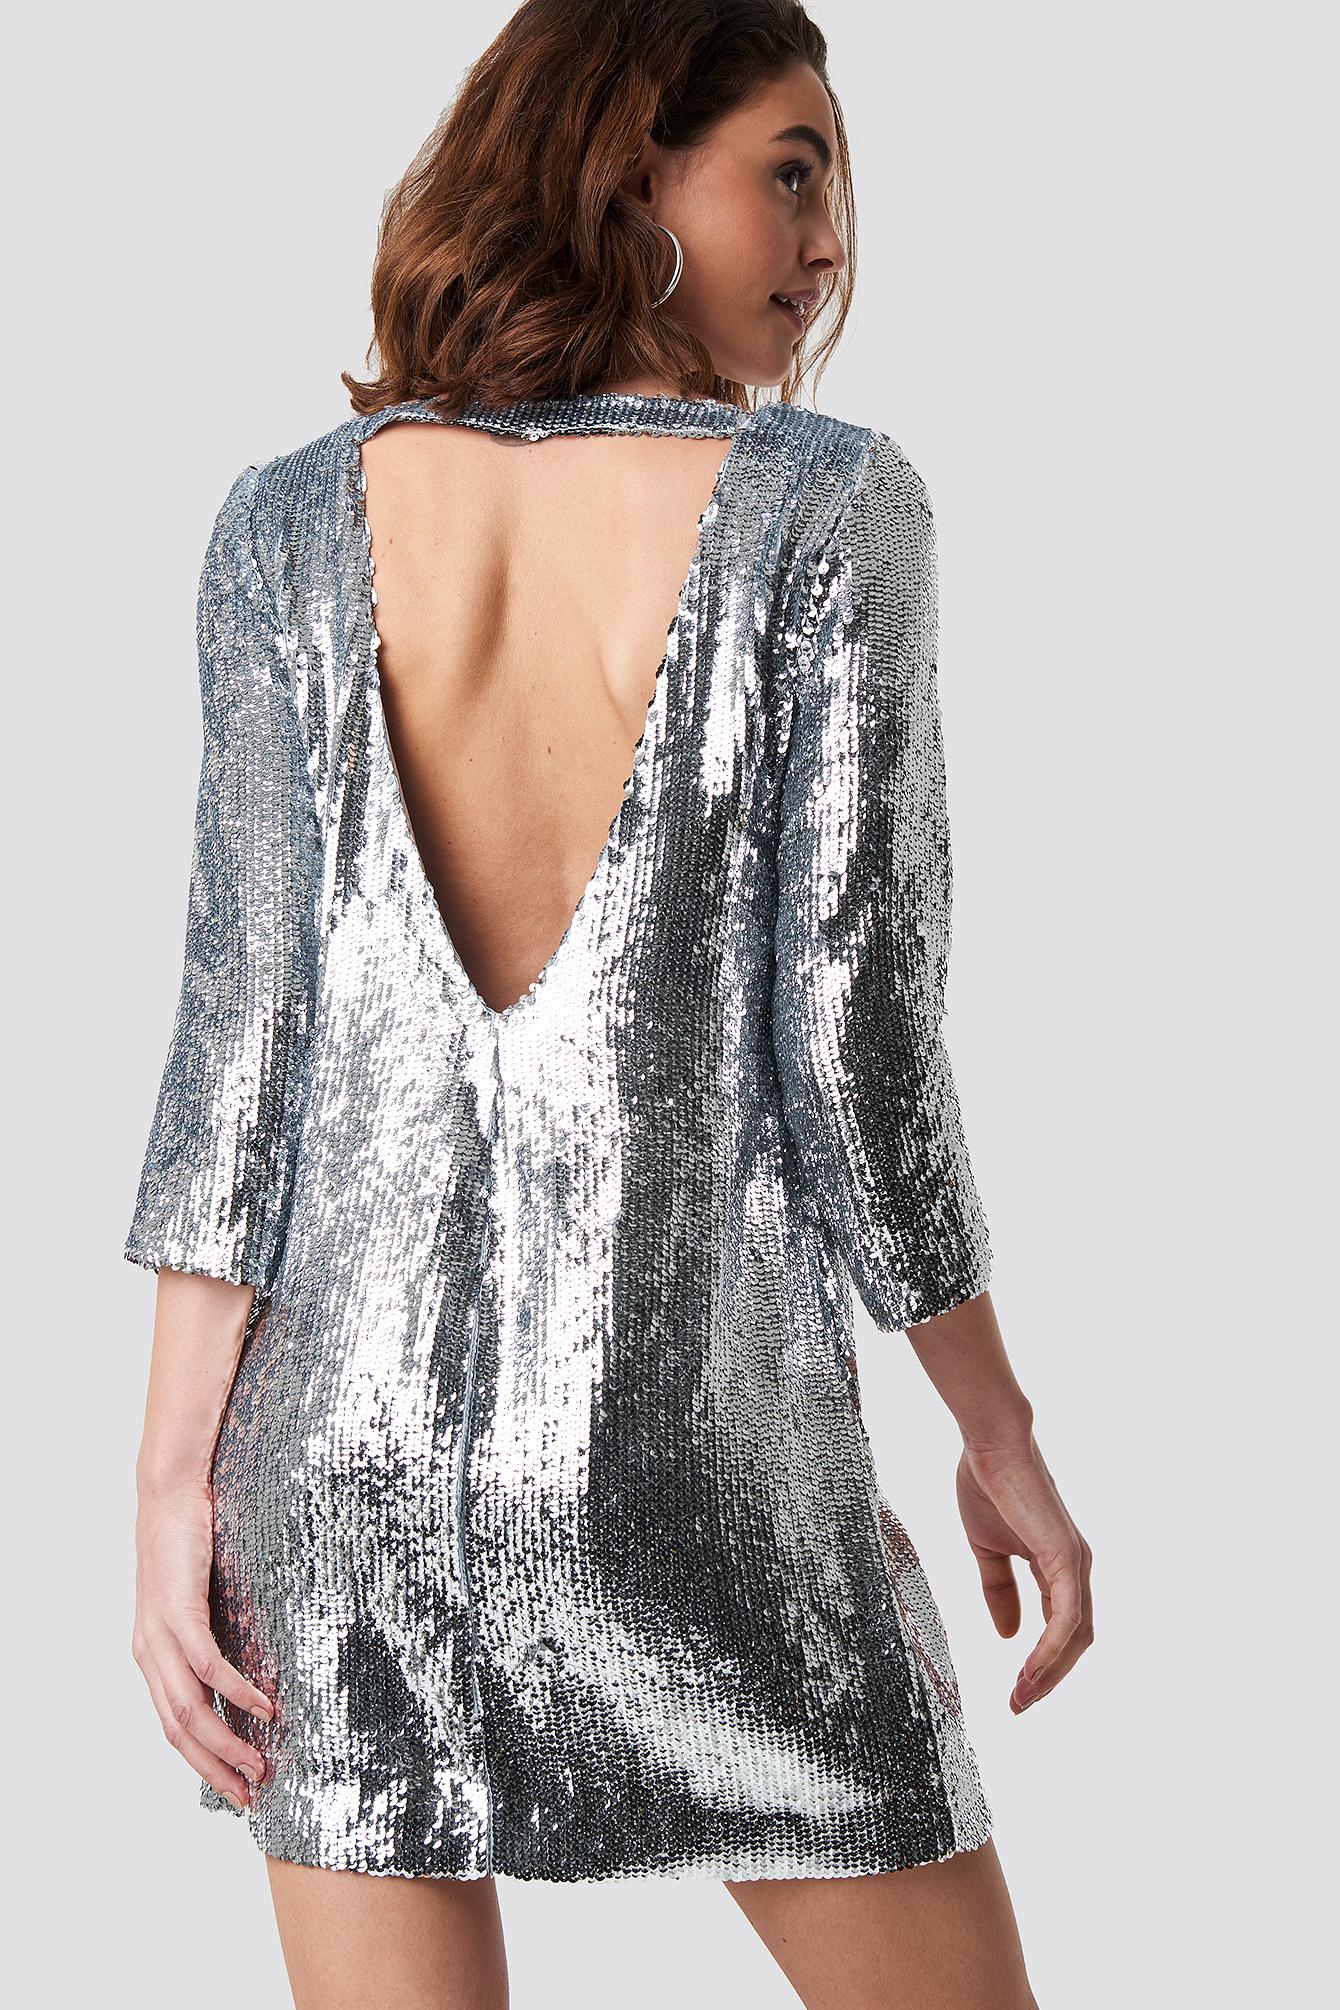 emilie briting x na-kd -  Sequin Short Dress - Silver